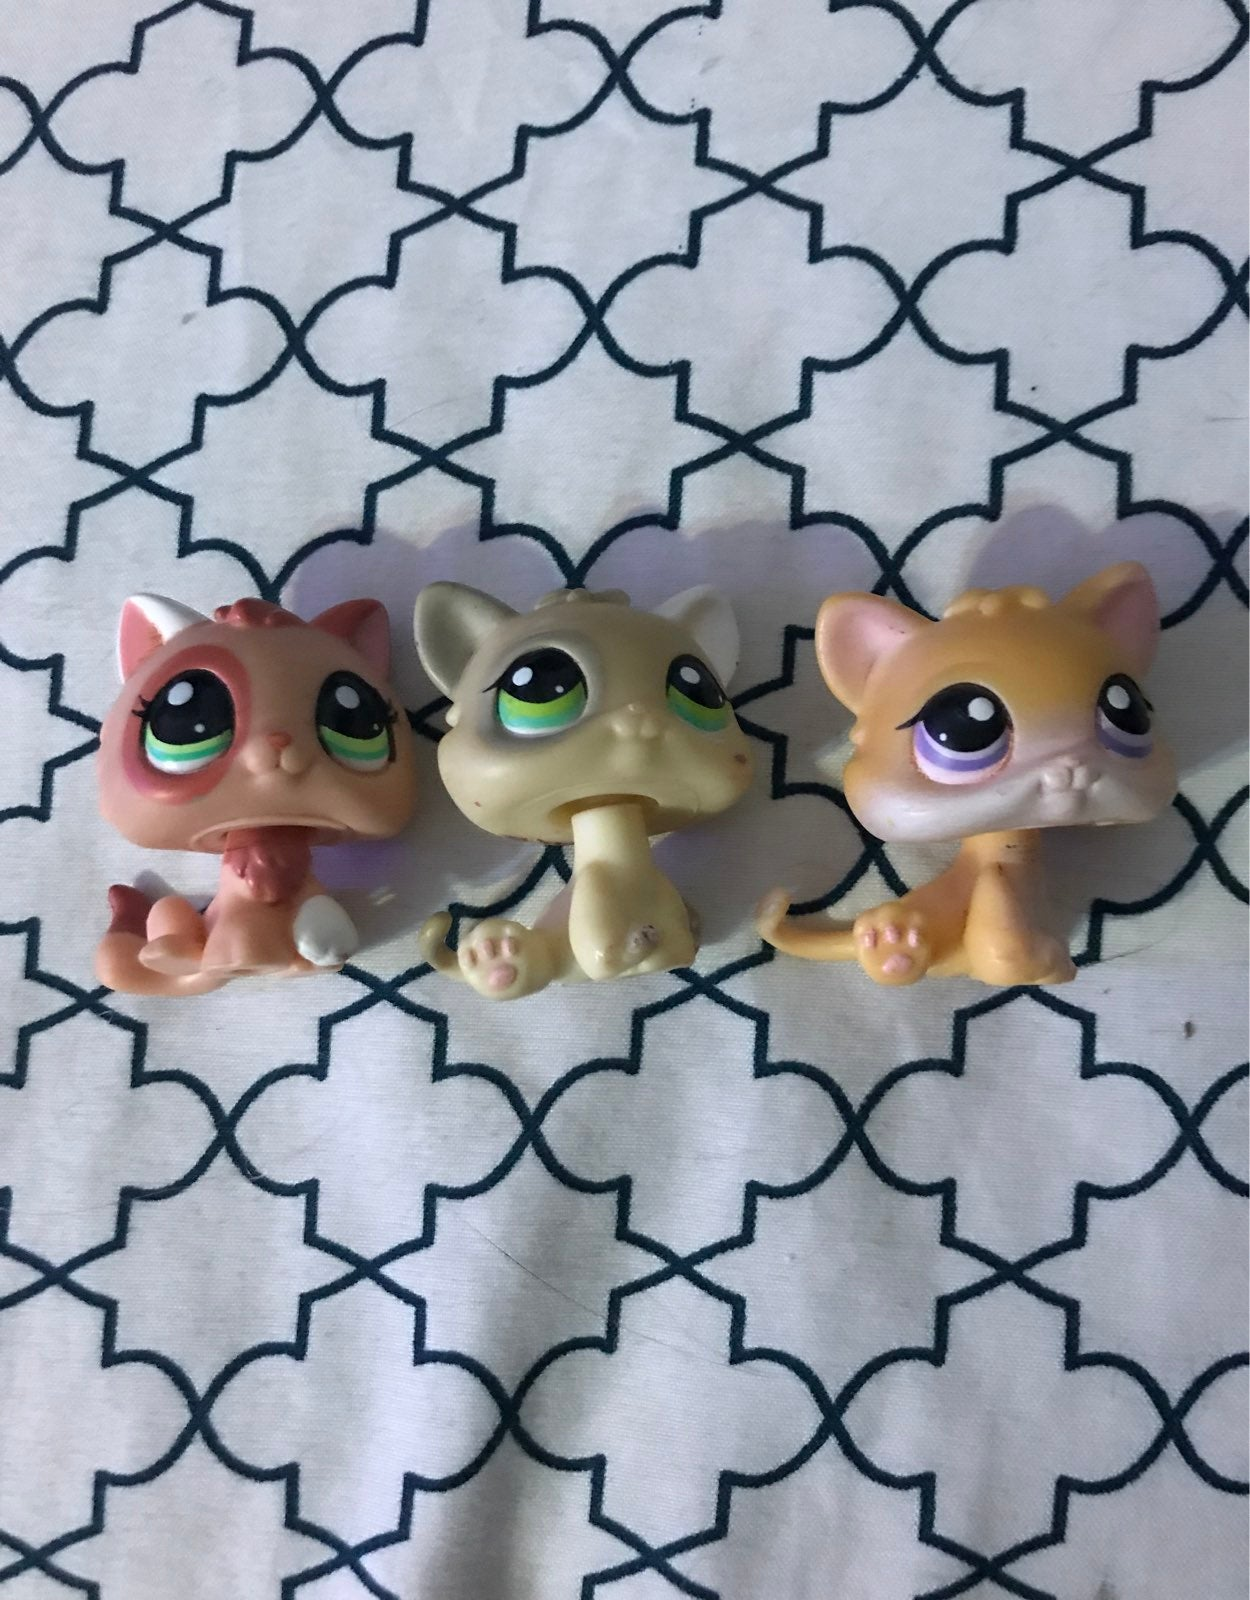 Lps Lot of 3 Kittens